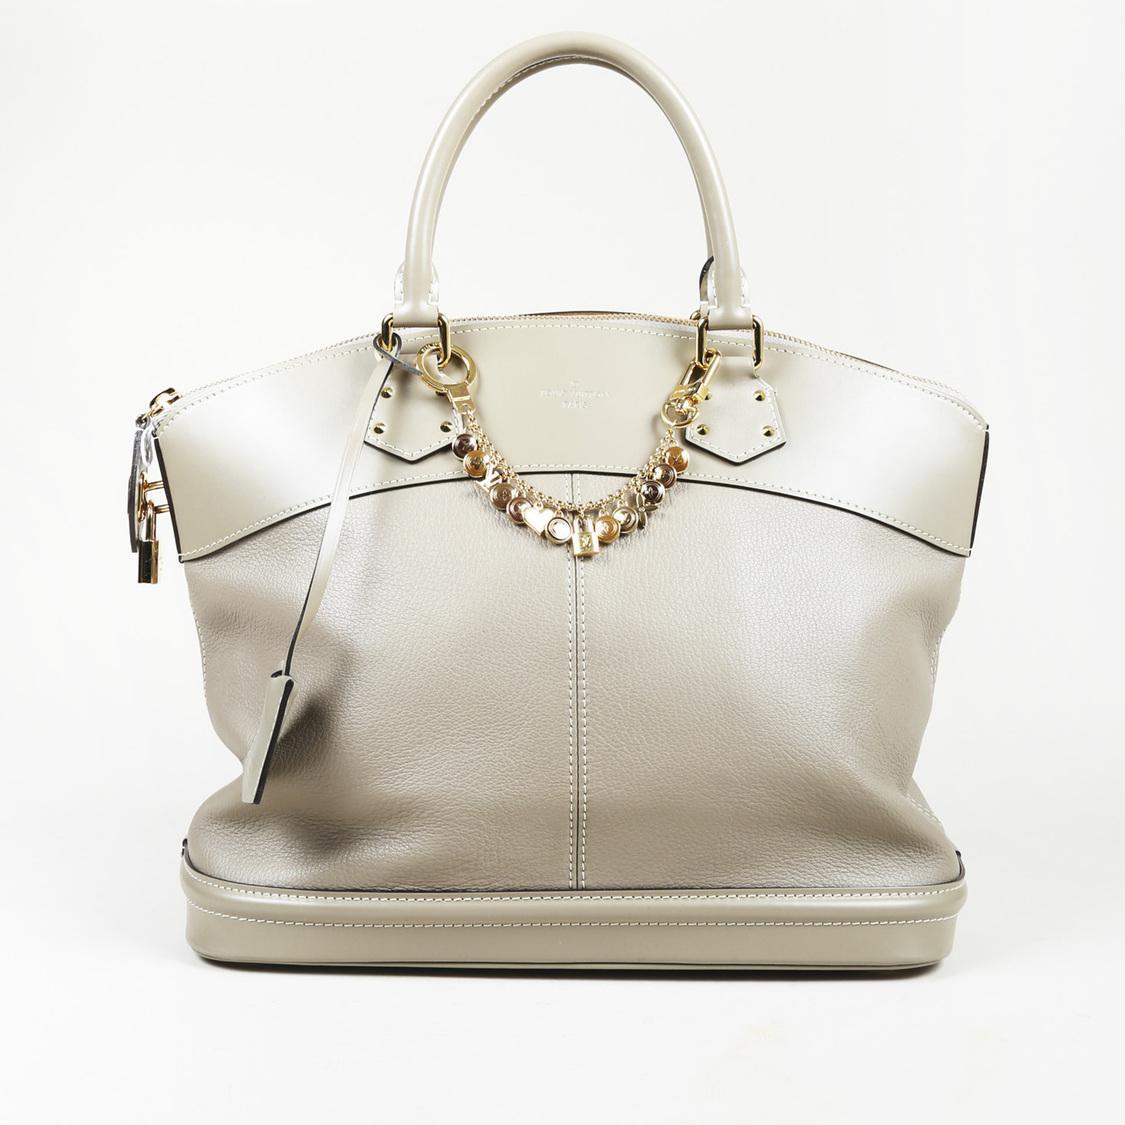 92fd82ebd47a Lyst - Louis Vuitton Lockit Leather Handbag in Gray